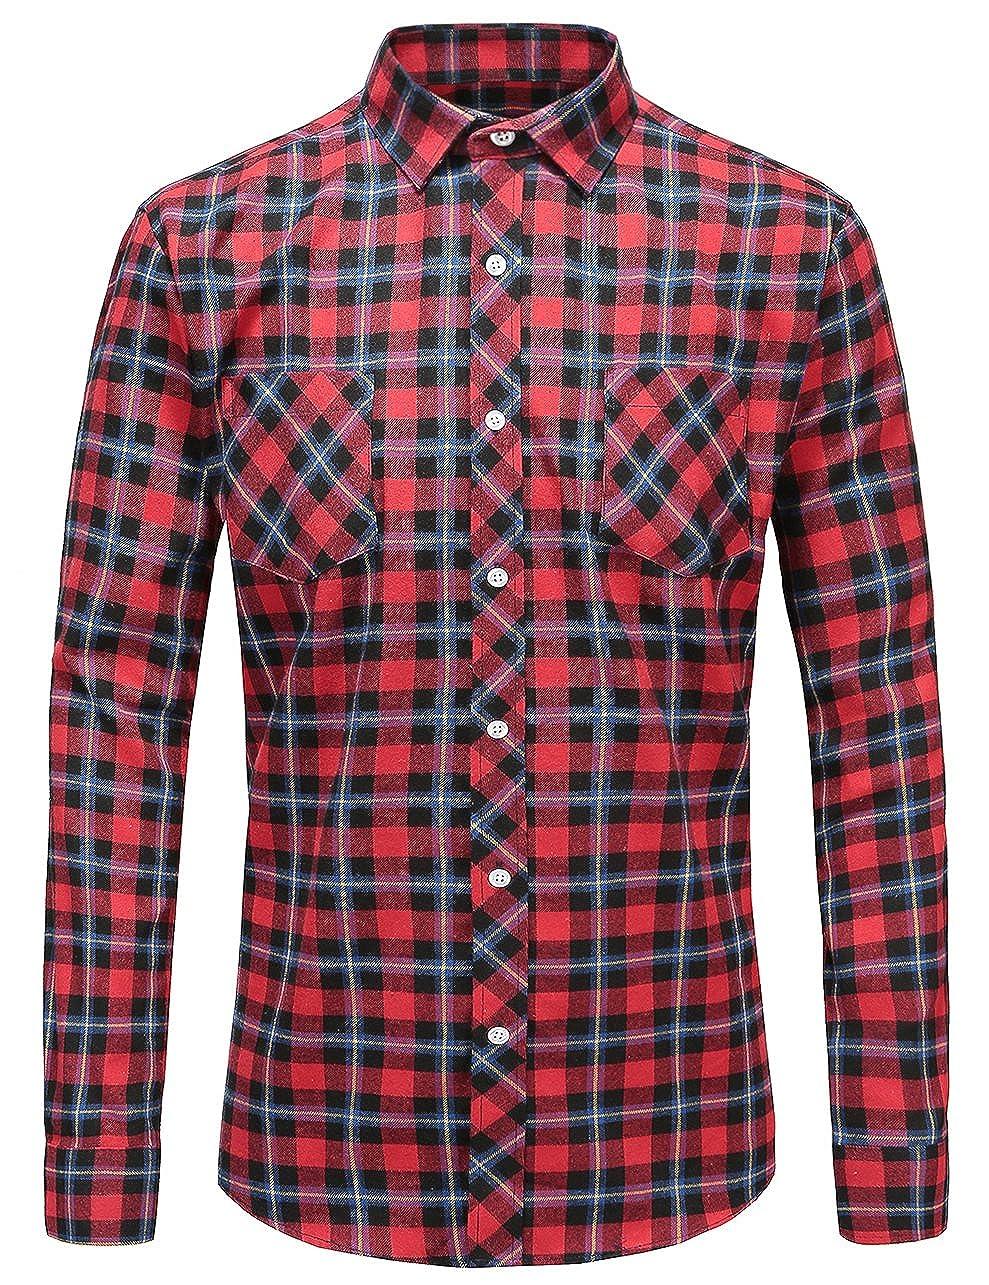 JEETOO Men's Flannel Plaid Checkerd Long Sleeve Button Down Shirts